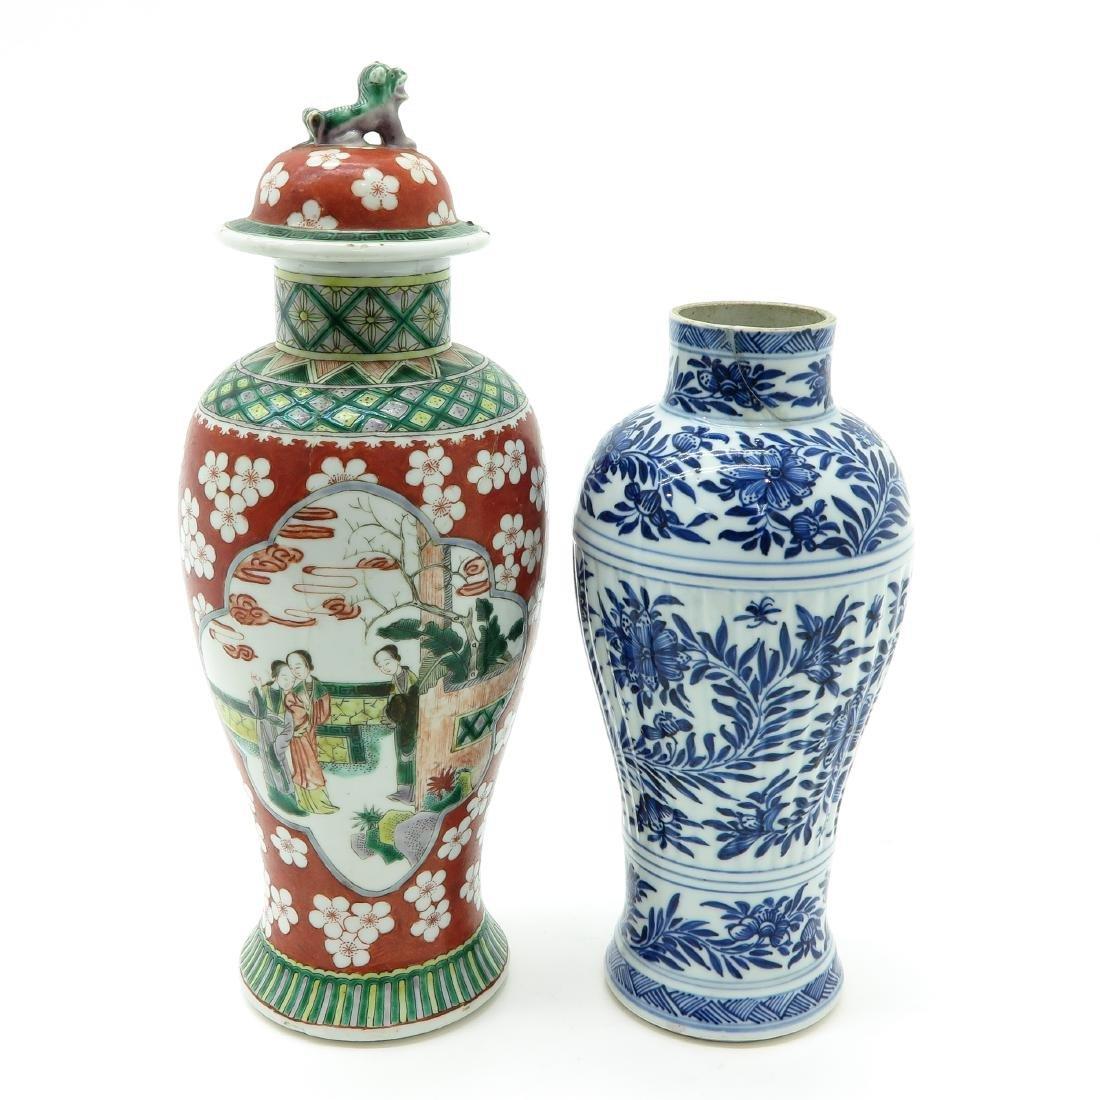 Lot of 2 Vases - 3